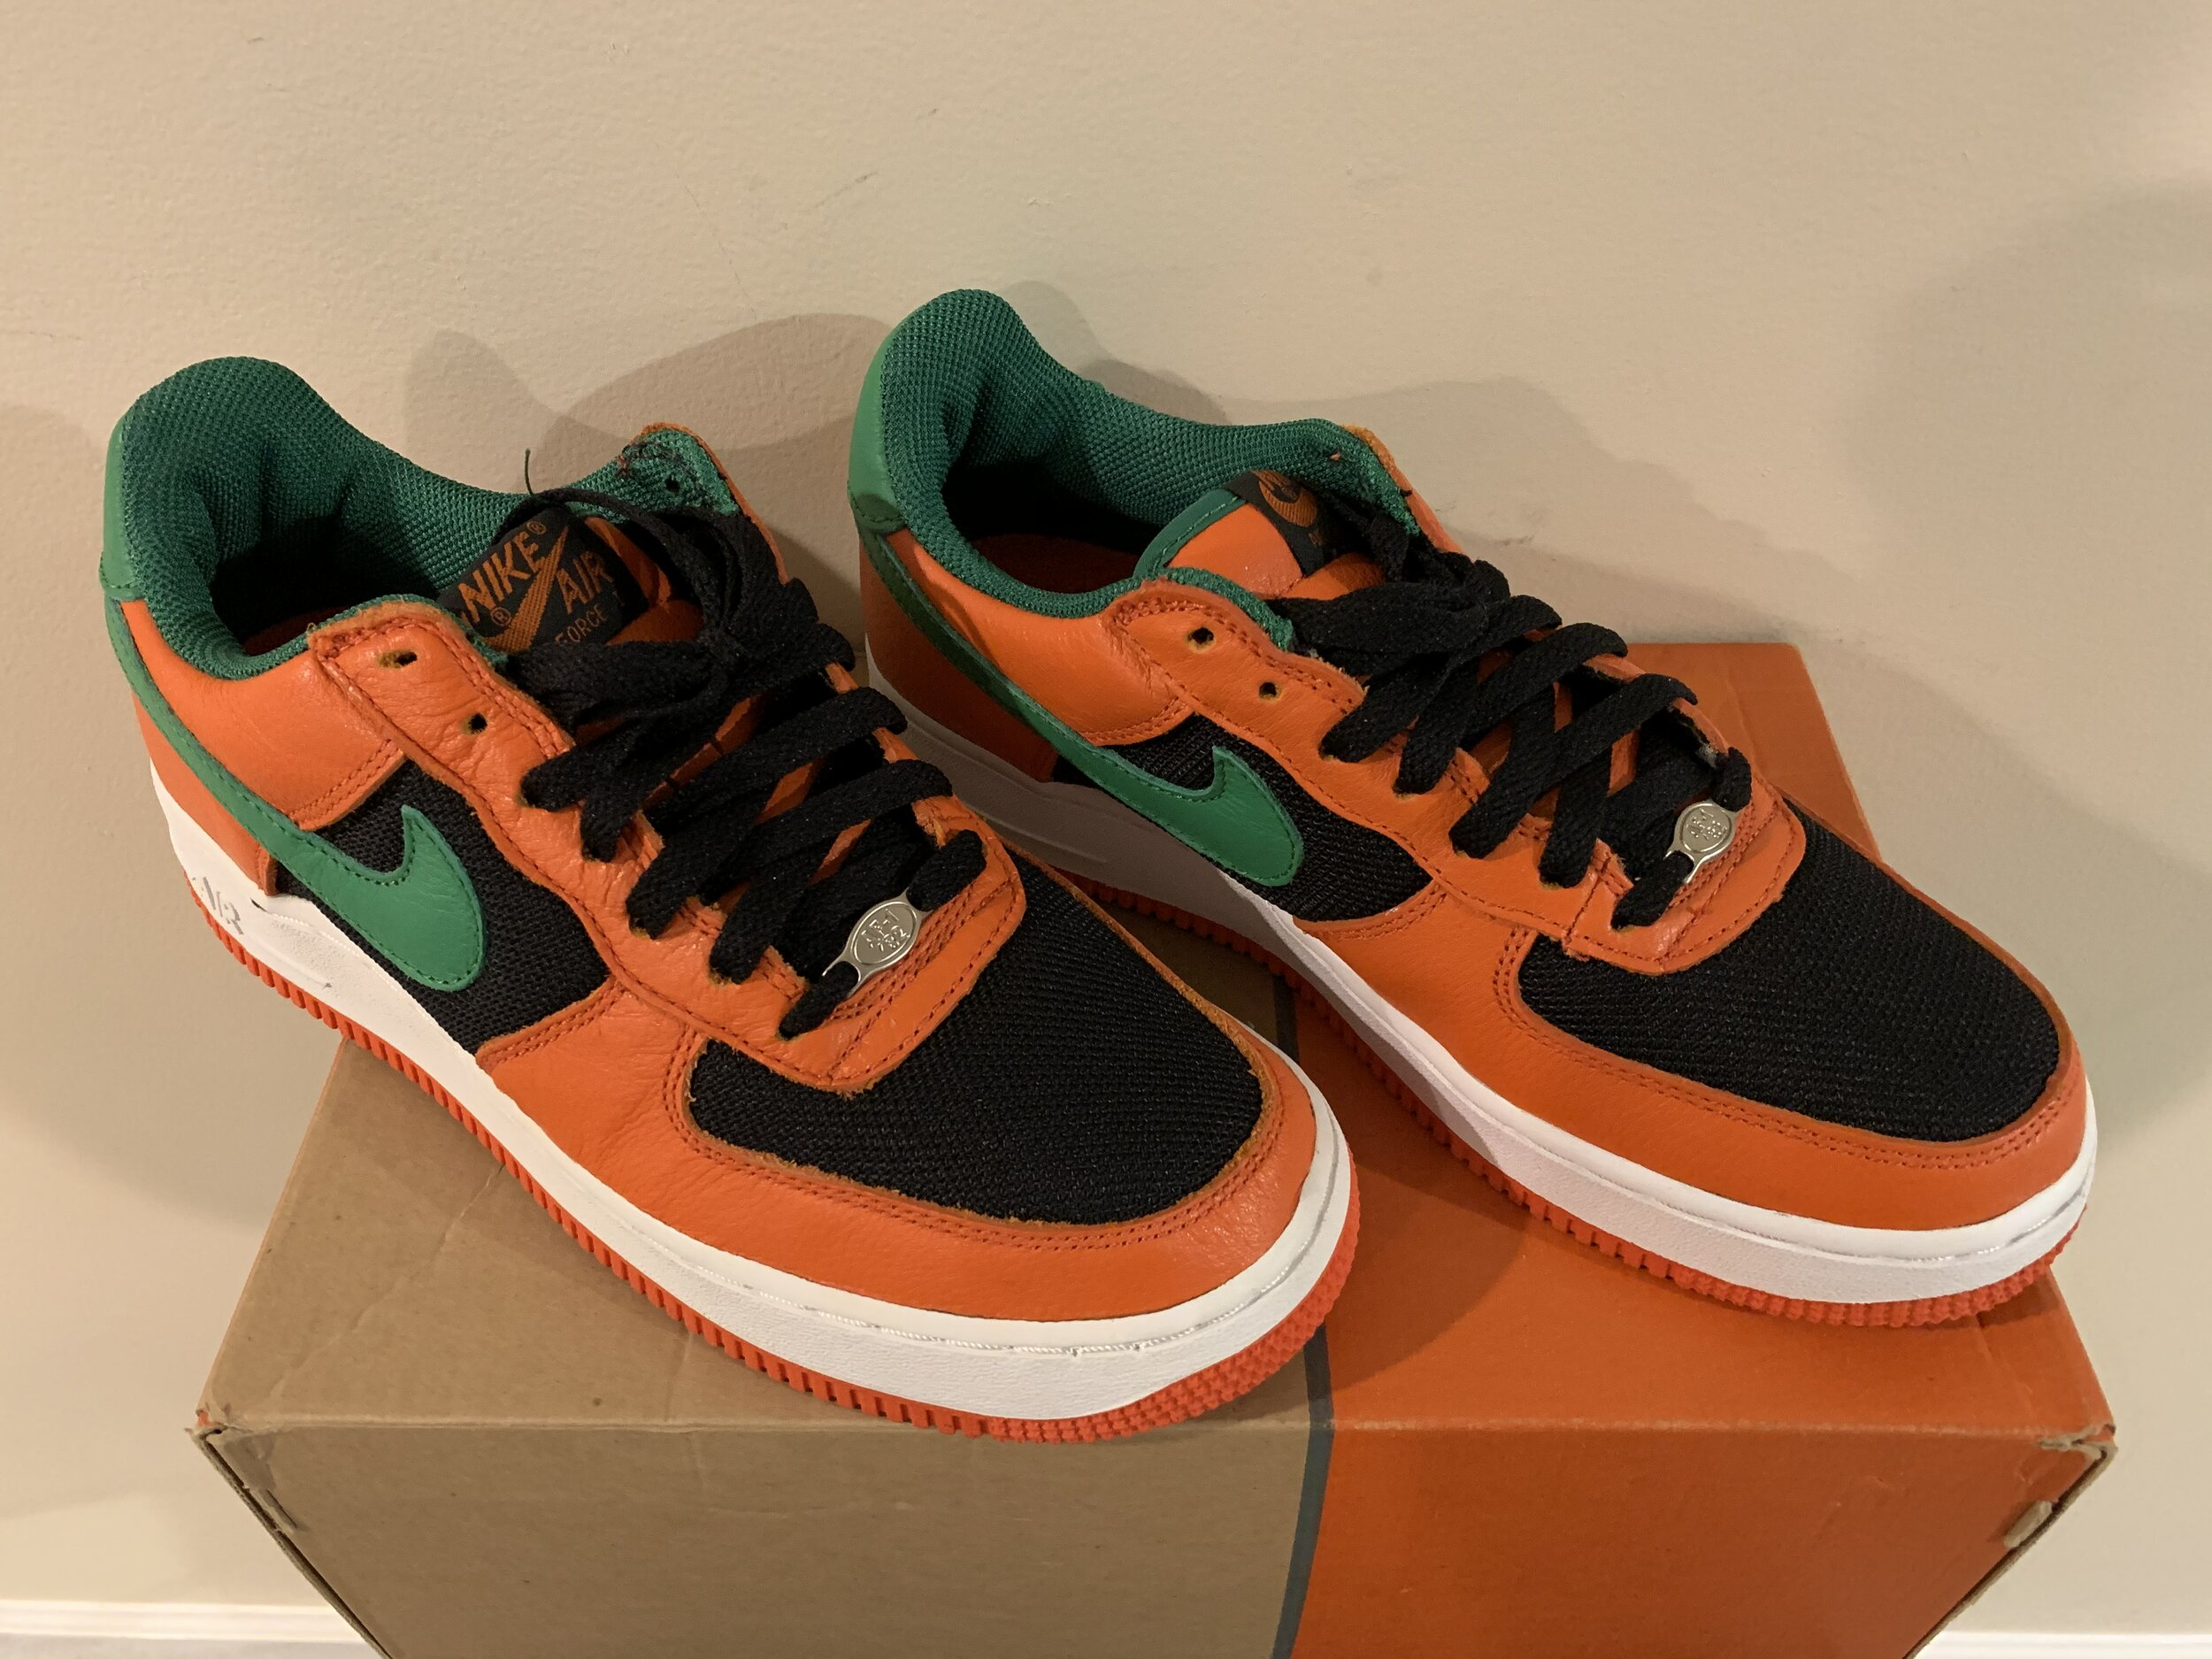 Nike Air Force 1 Low Carnival — DLo's Flipshop